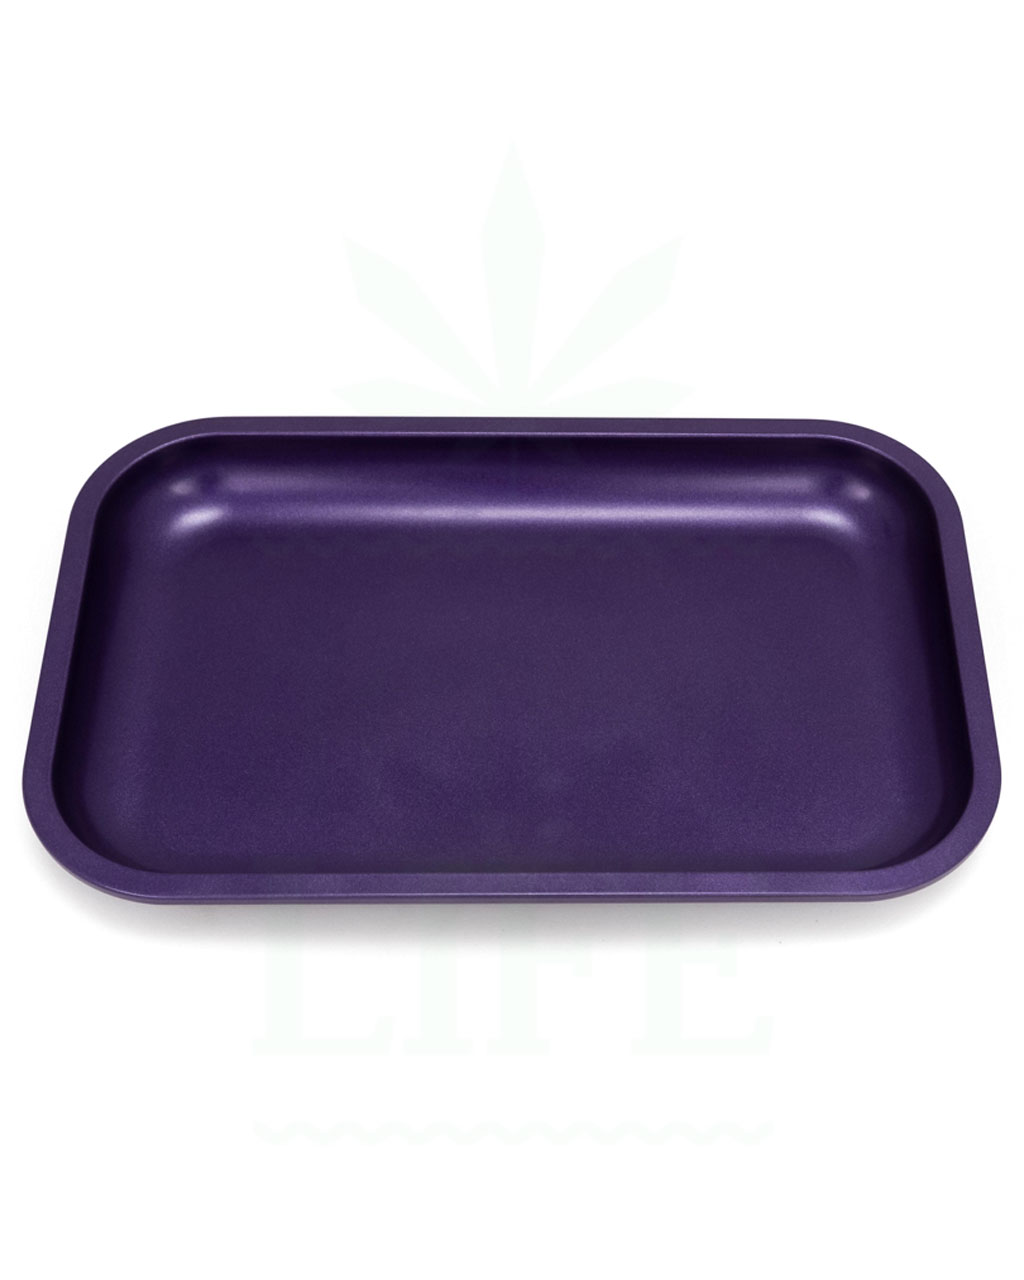 aus Metall SLX Keramikbeschichtetes Rolling Tray | M